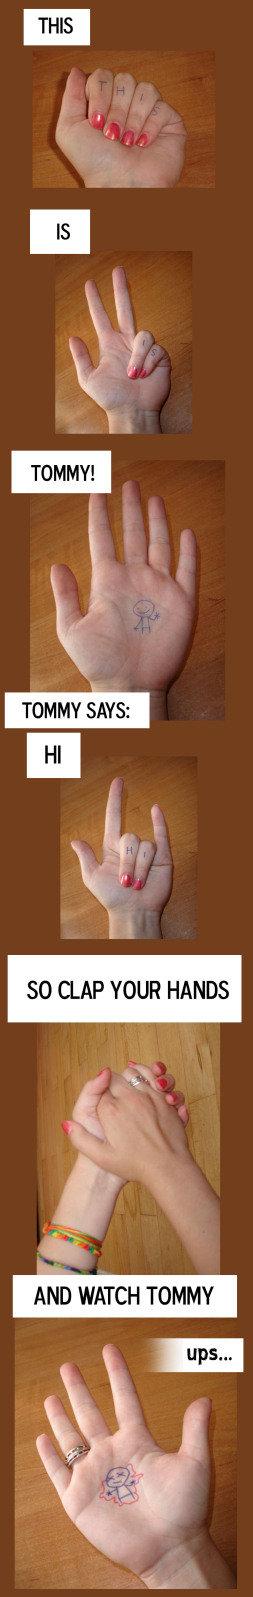 He says hi. say hi. THE TOMMY! He says hi